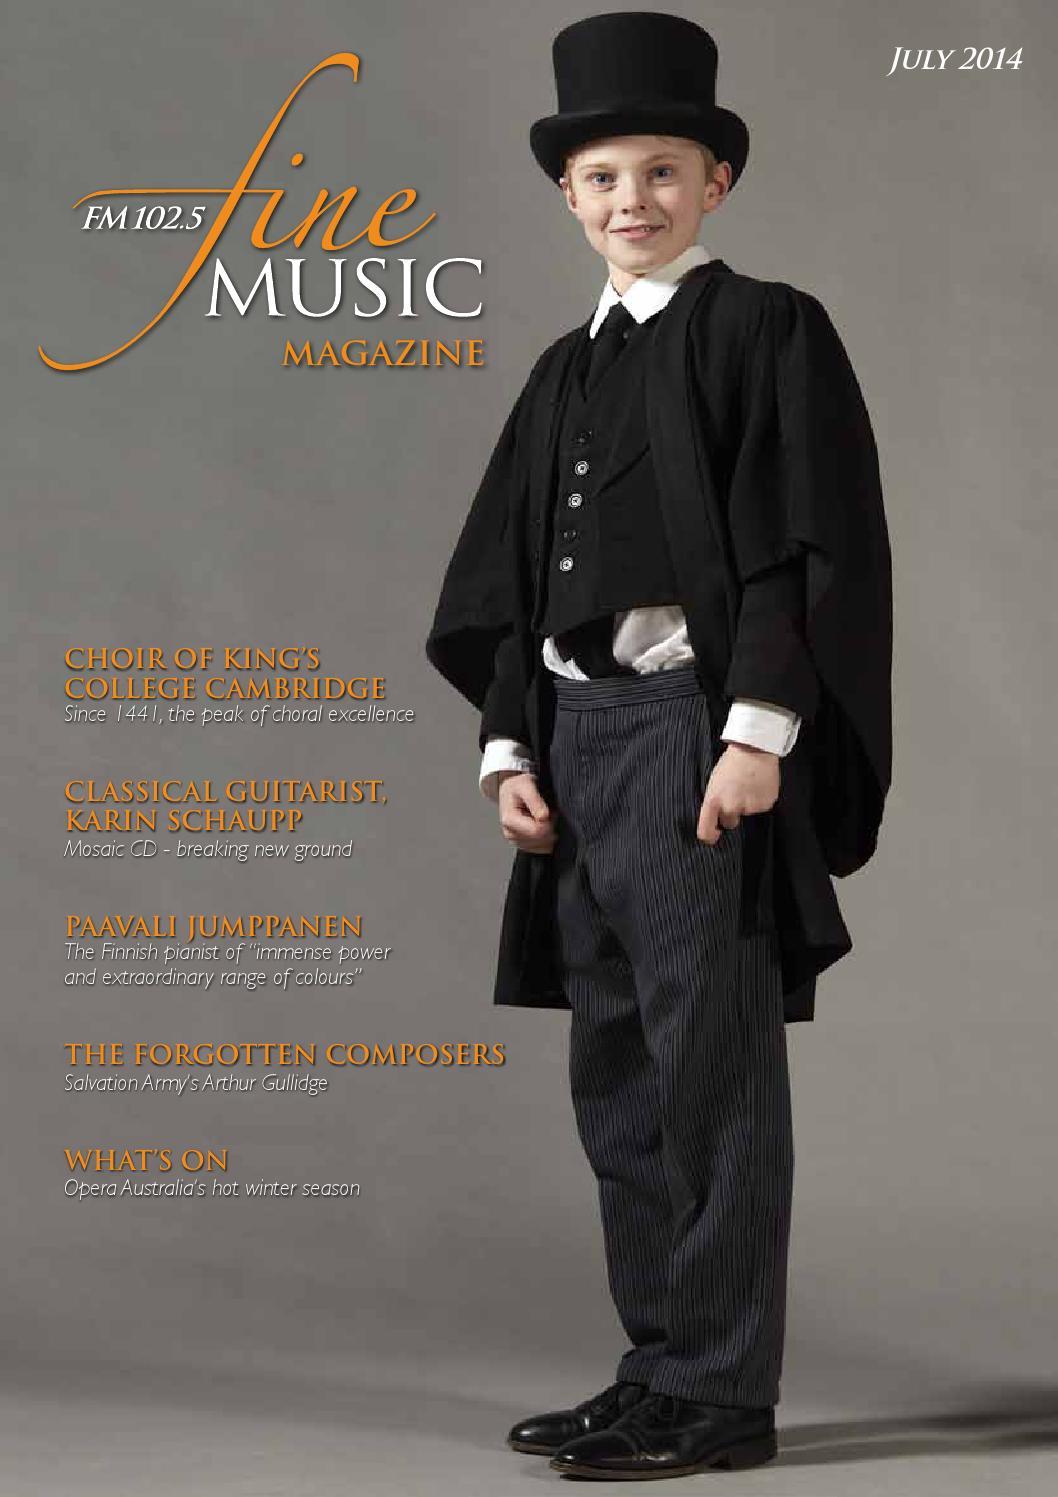 Fine Music Magazine July 2014 by Editor - issuu